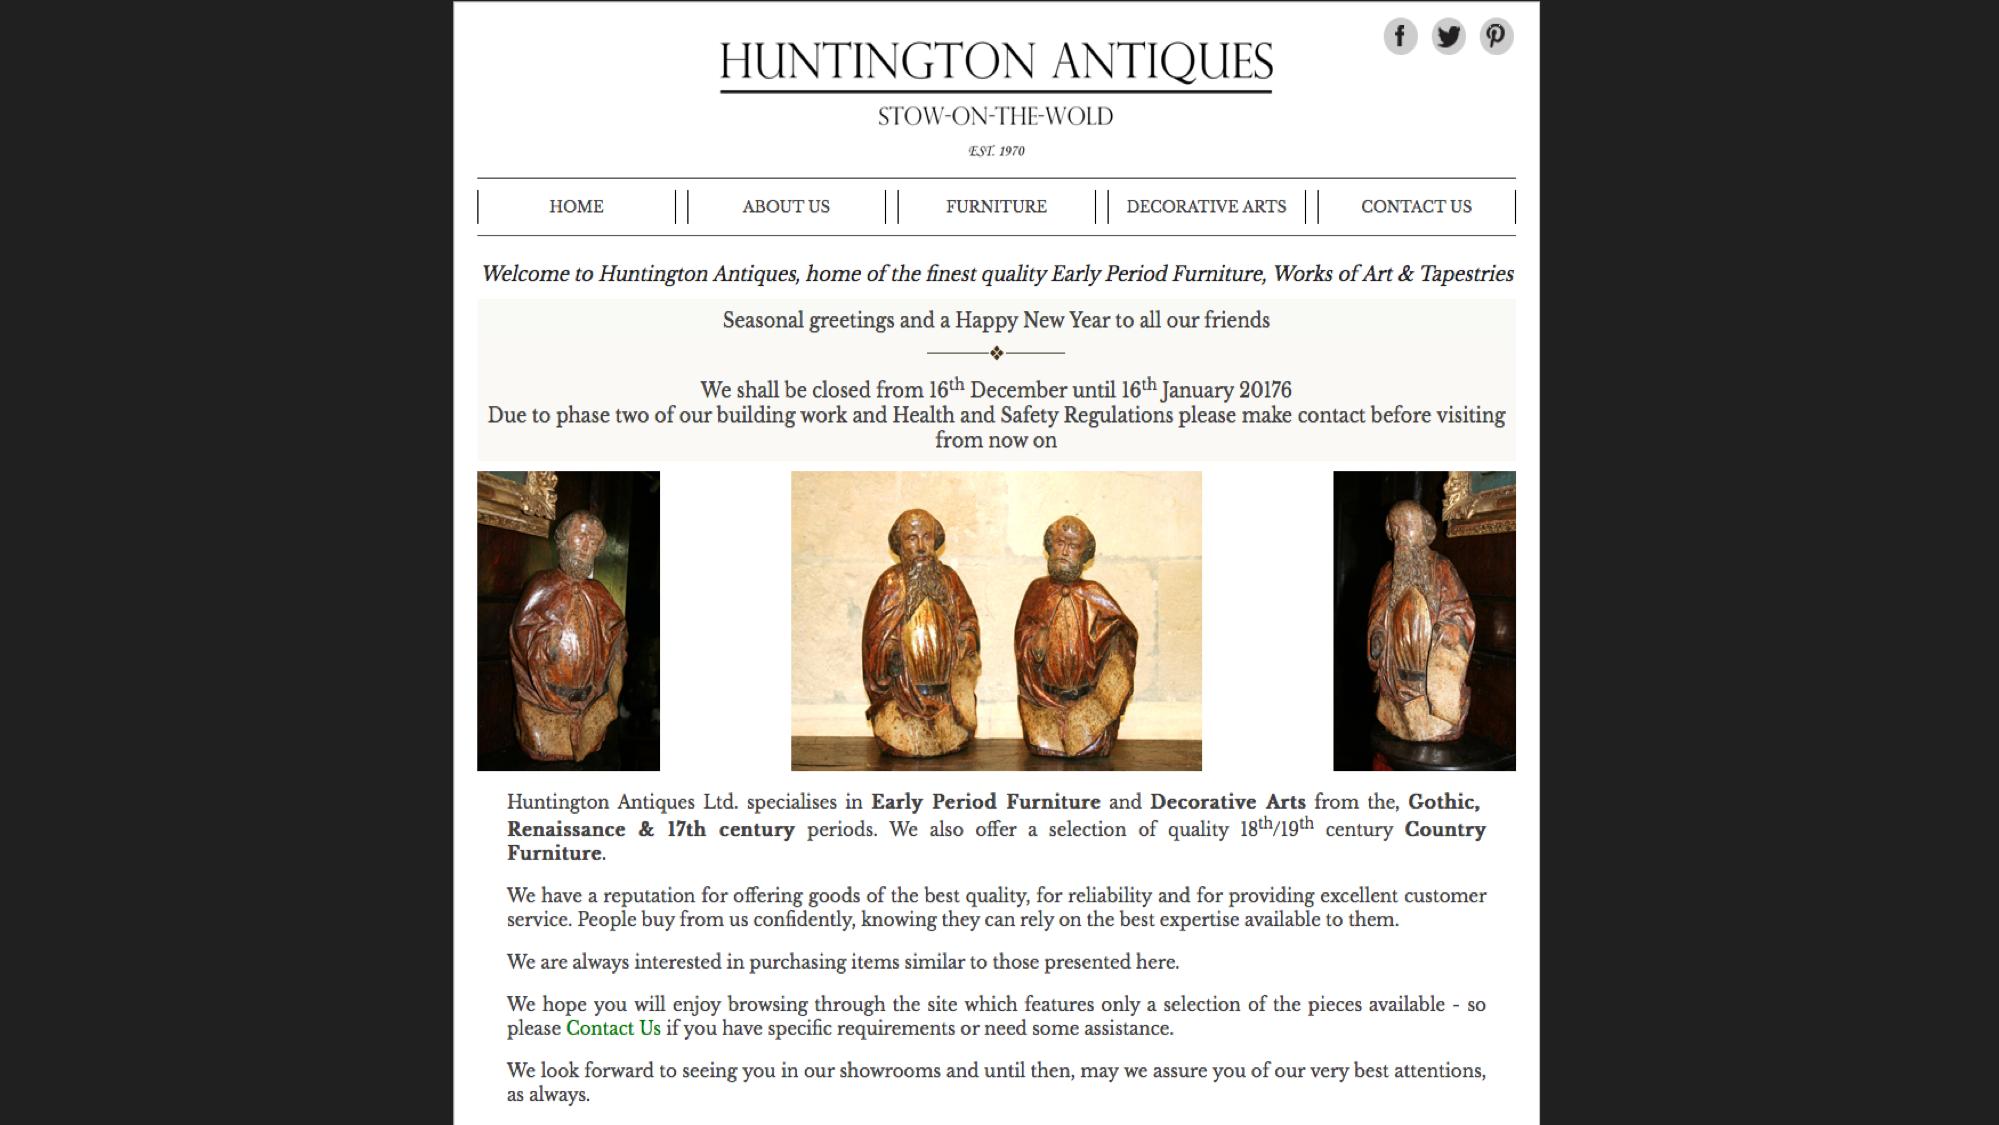 huntington antiques.png